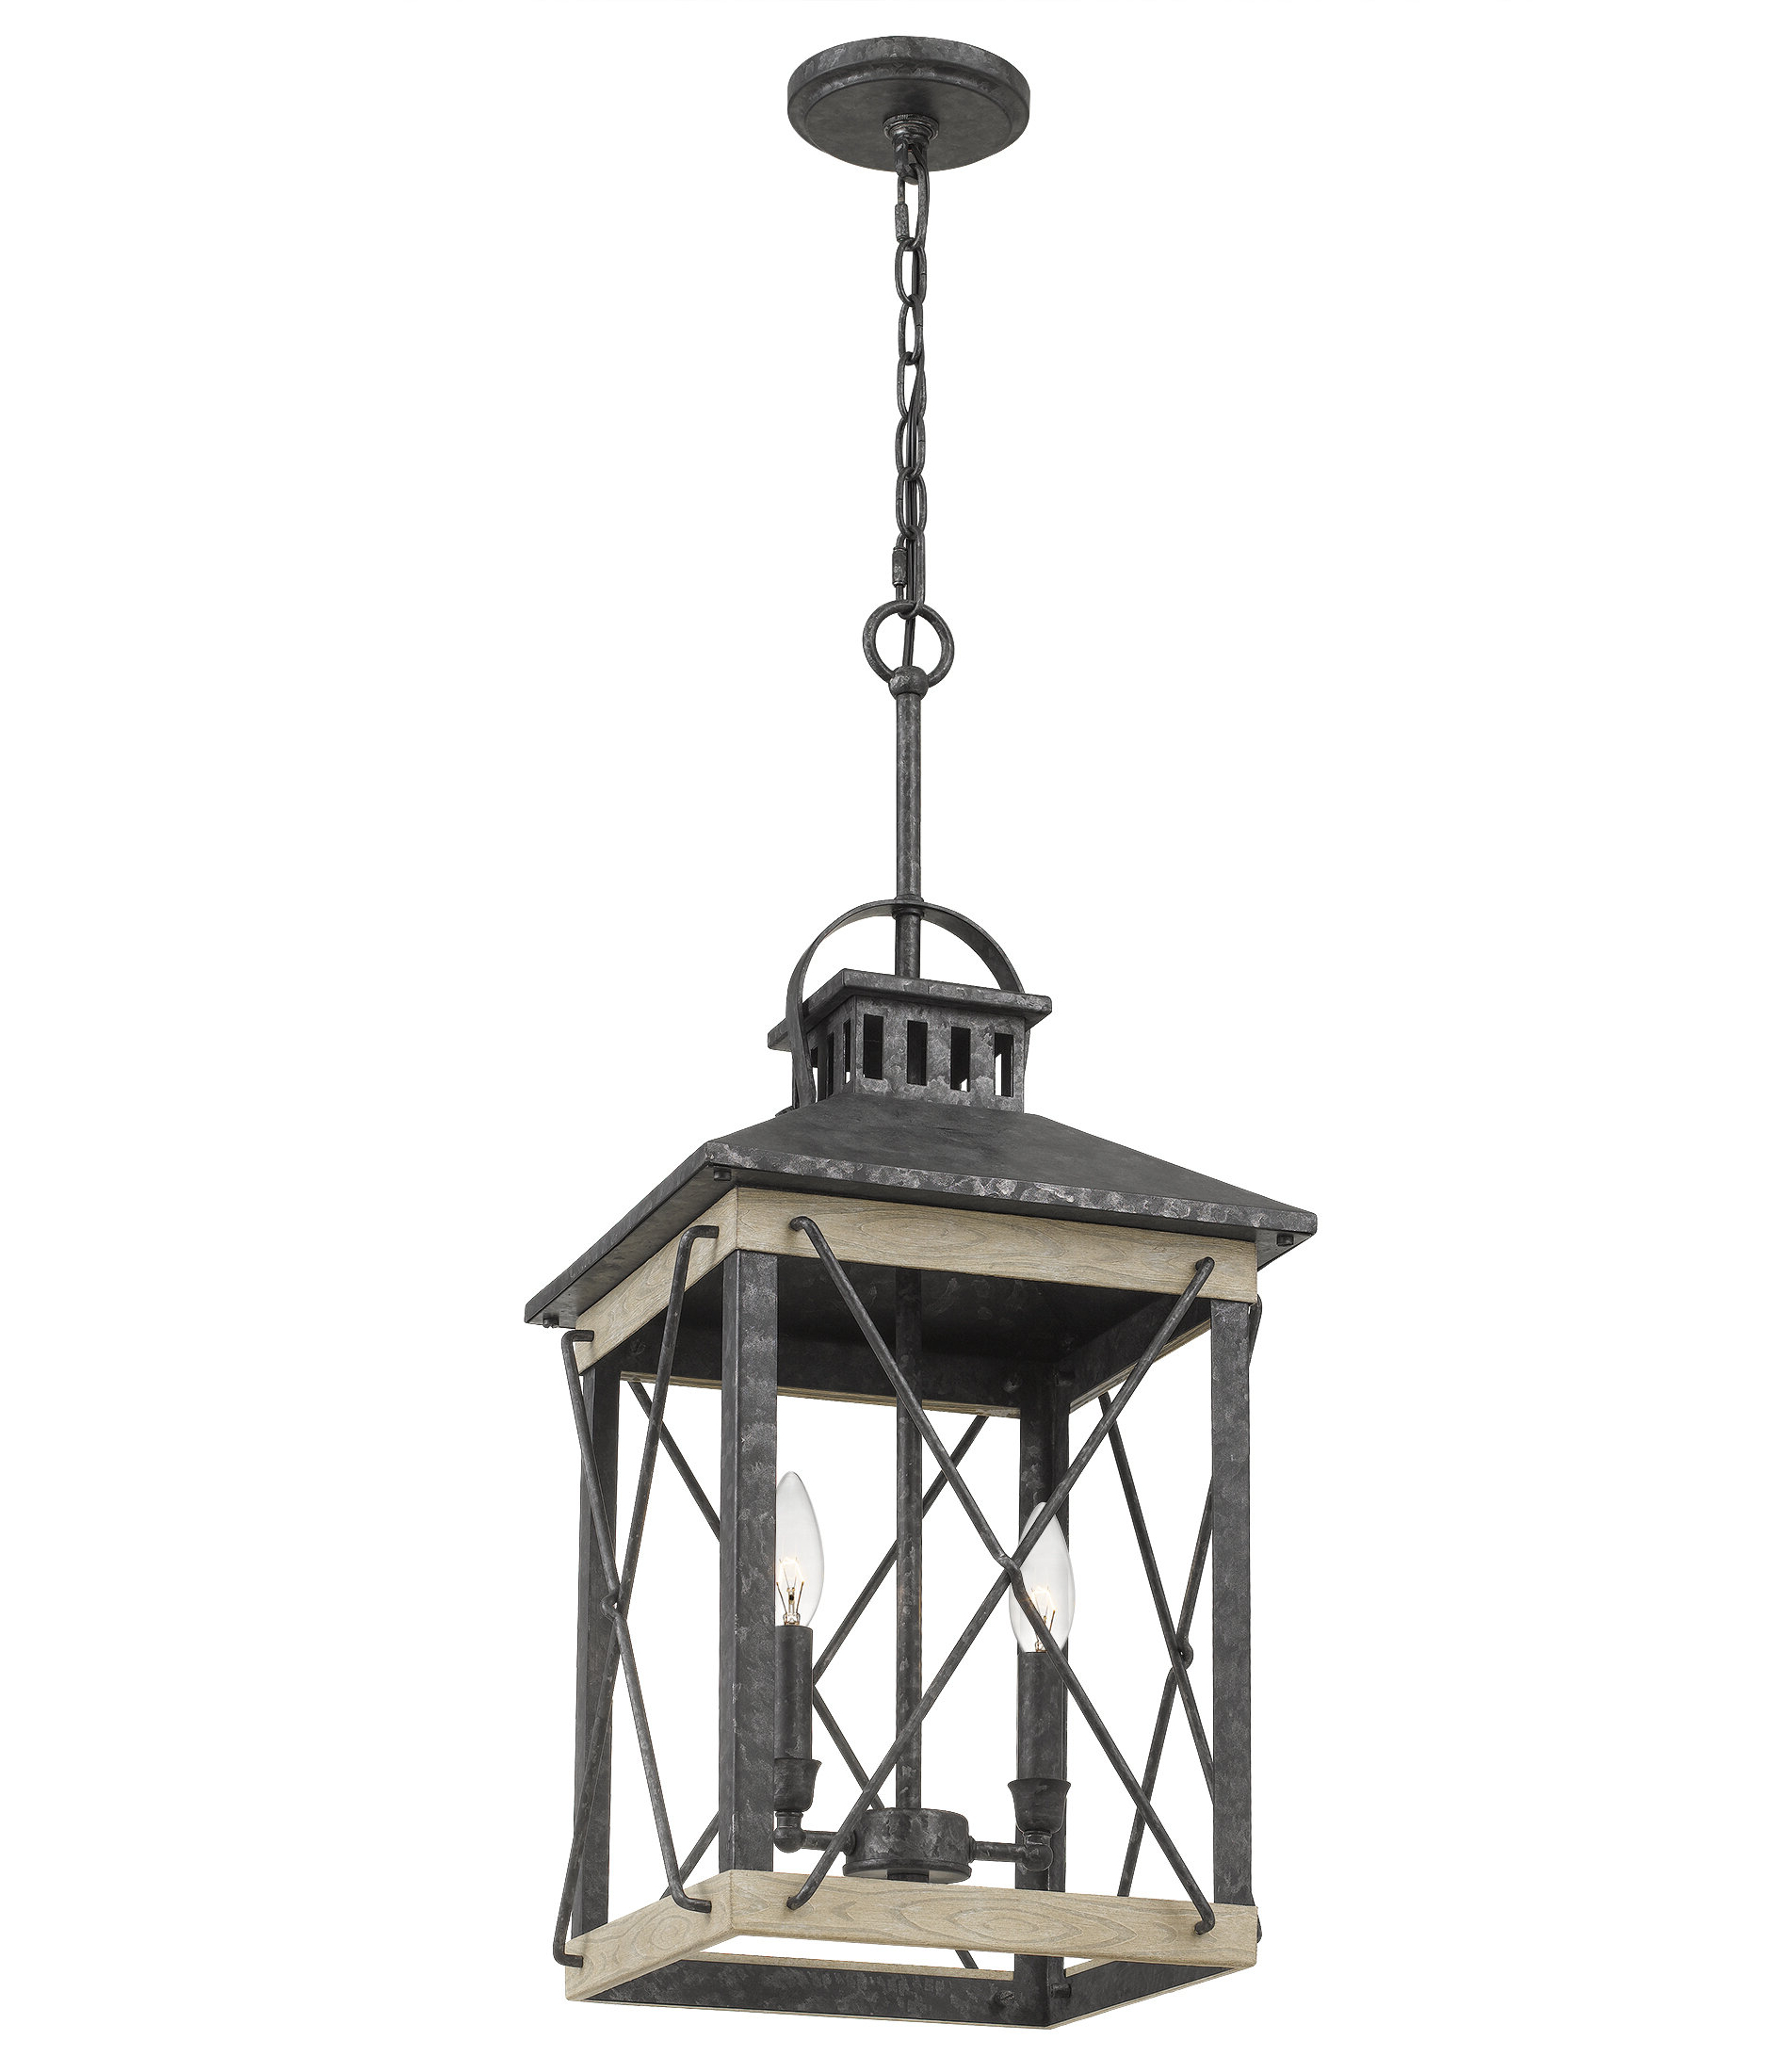 Detroit 2-Light Lantern Rectangle Pendant pertaining to Recent Delon 1-Light Lantern Geometric Pendants